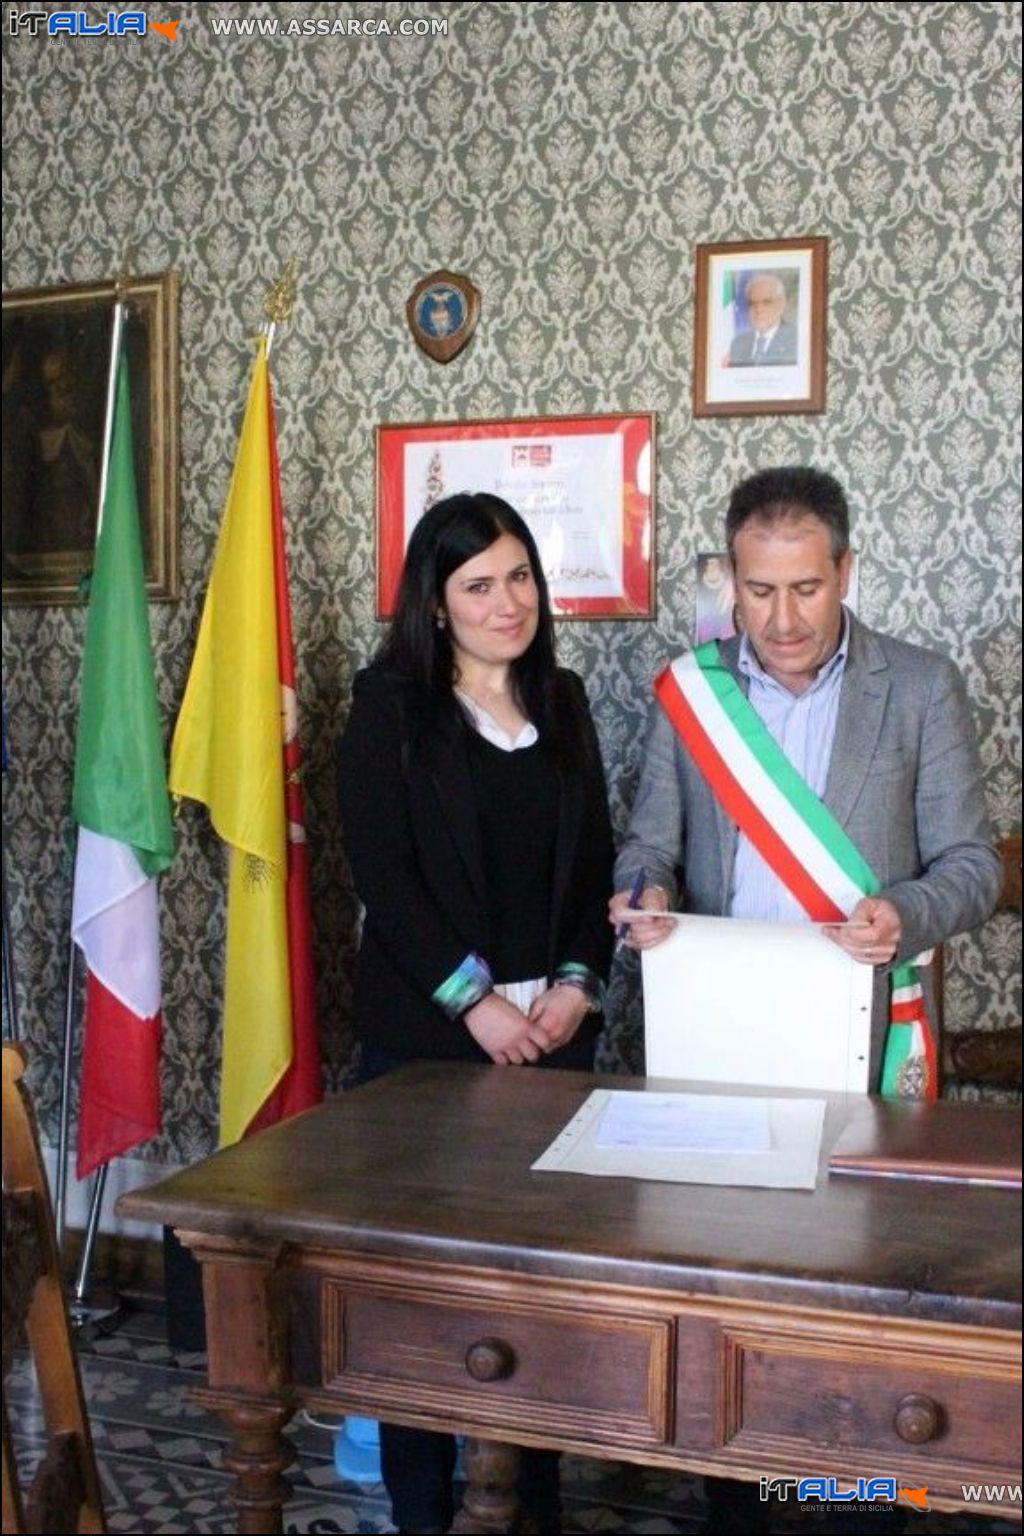 Il sindaco consegna cittadinanza italiana